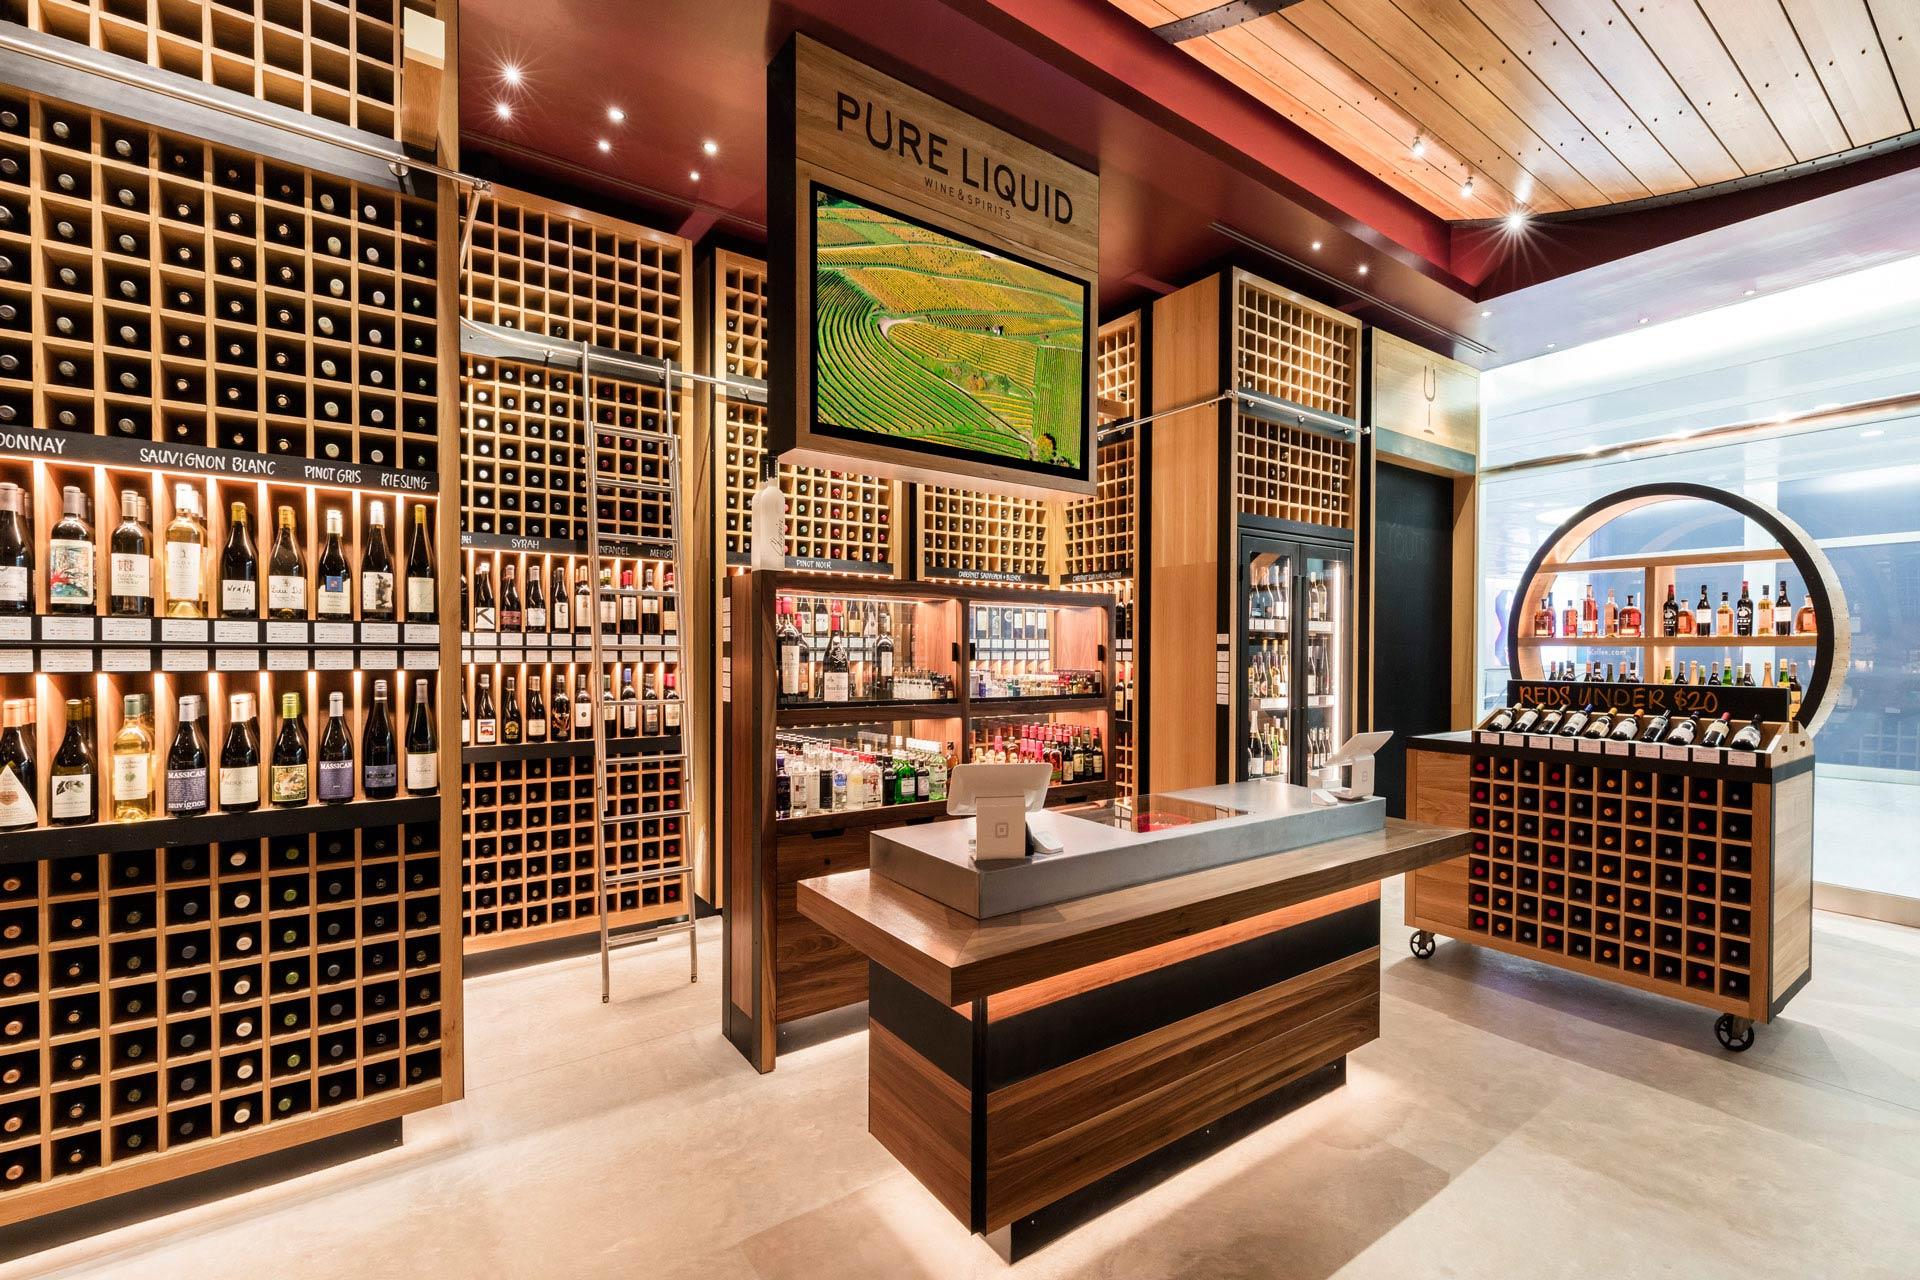 Pure Liquid Wine & Spirits retail store best design